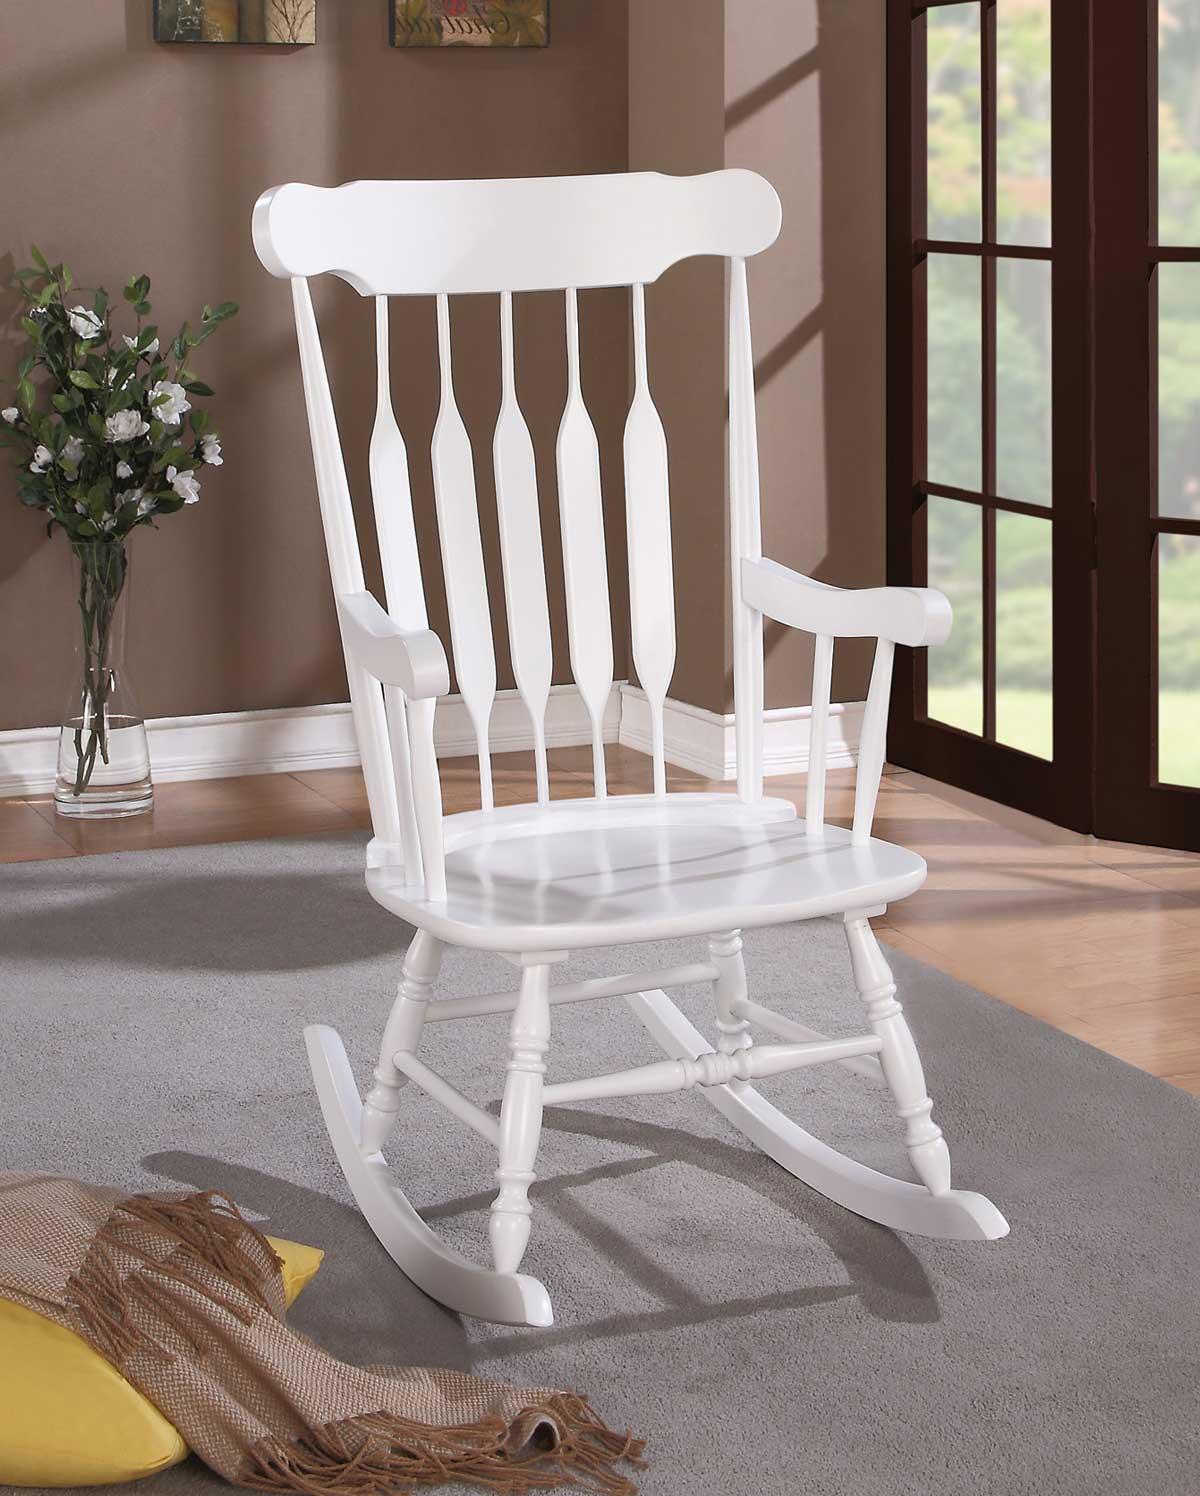 Coaster 600174 Rocking Chair - White